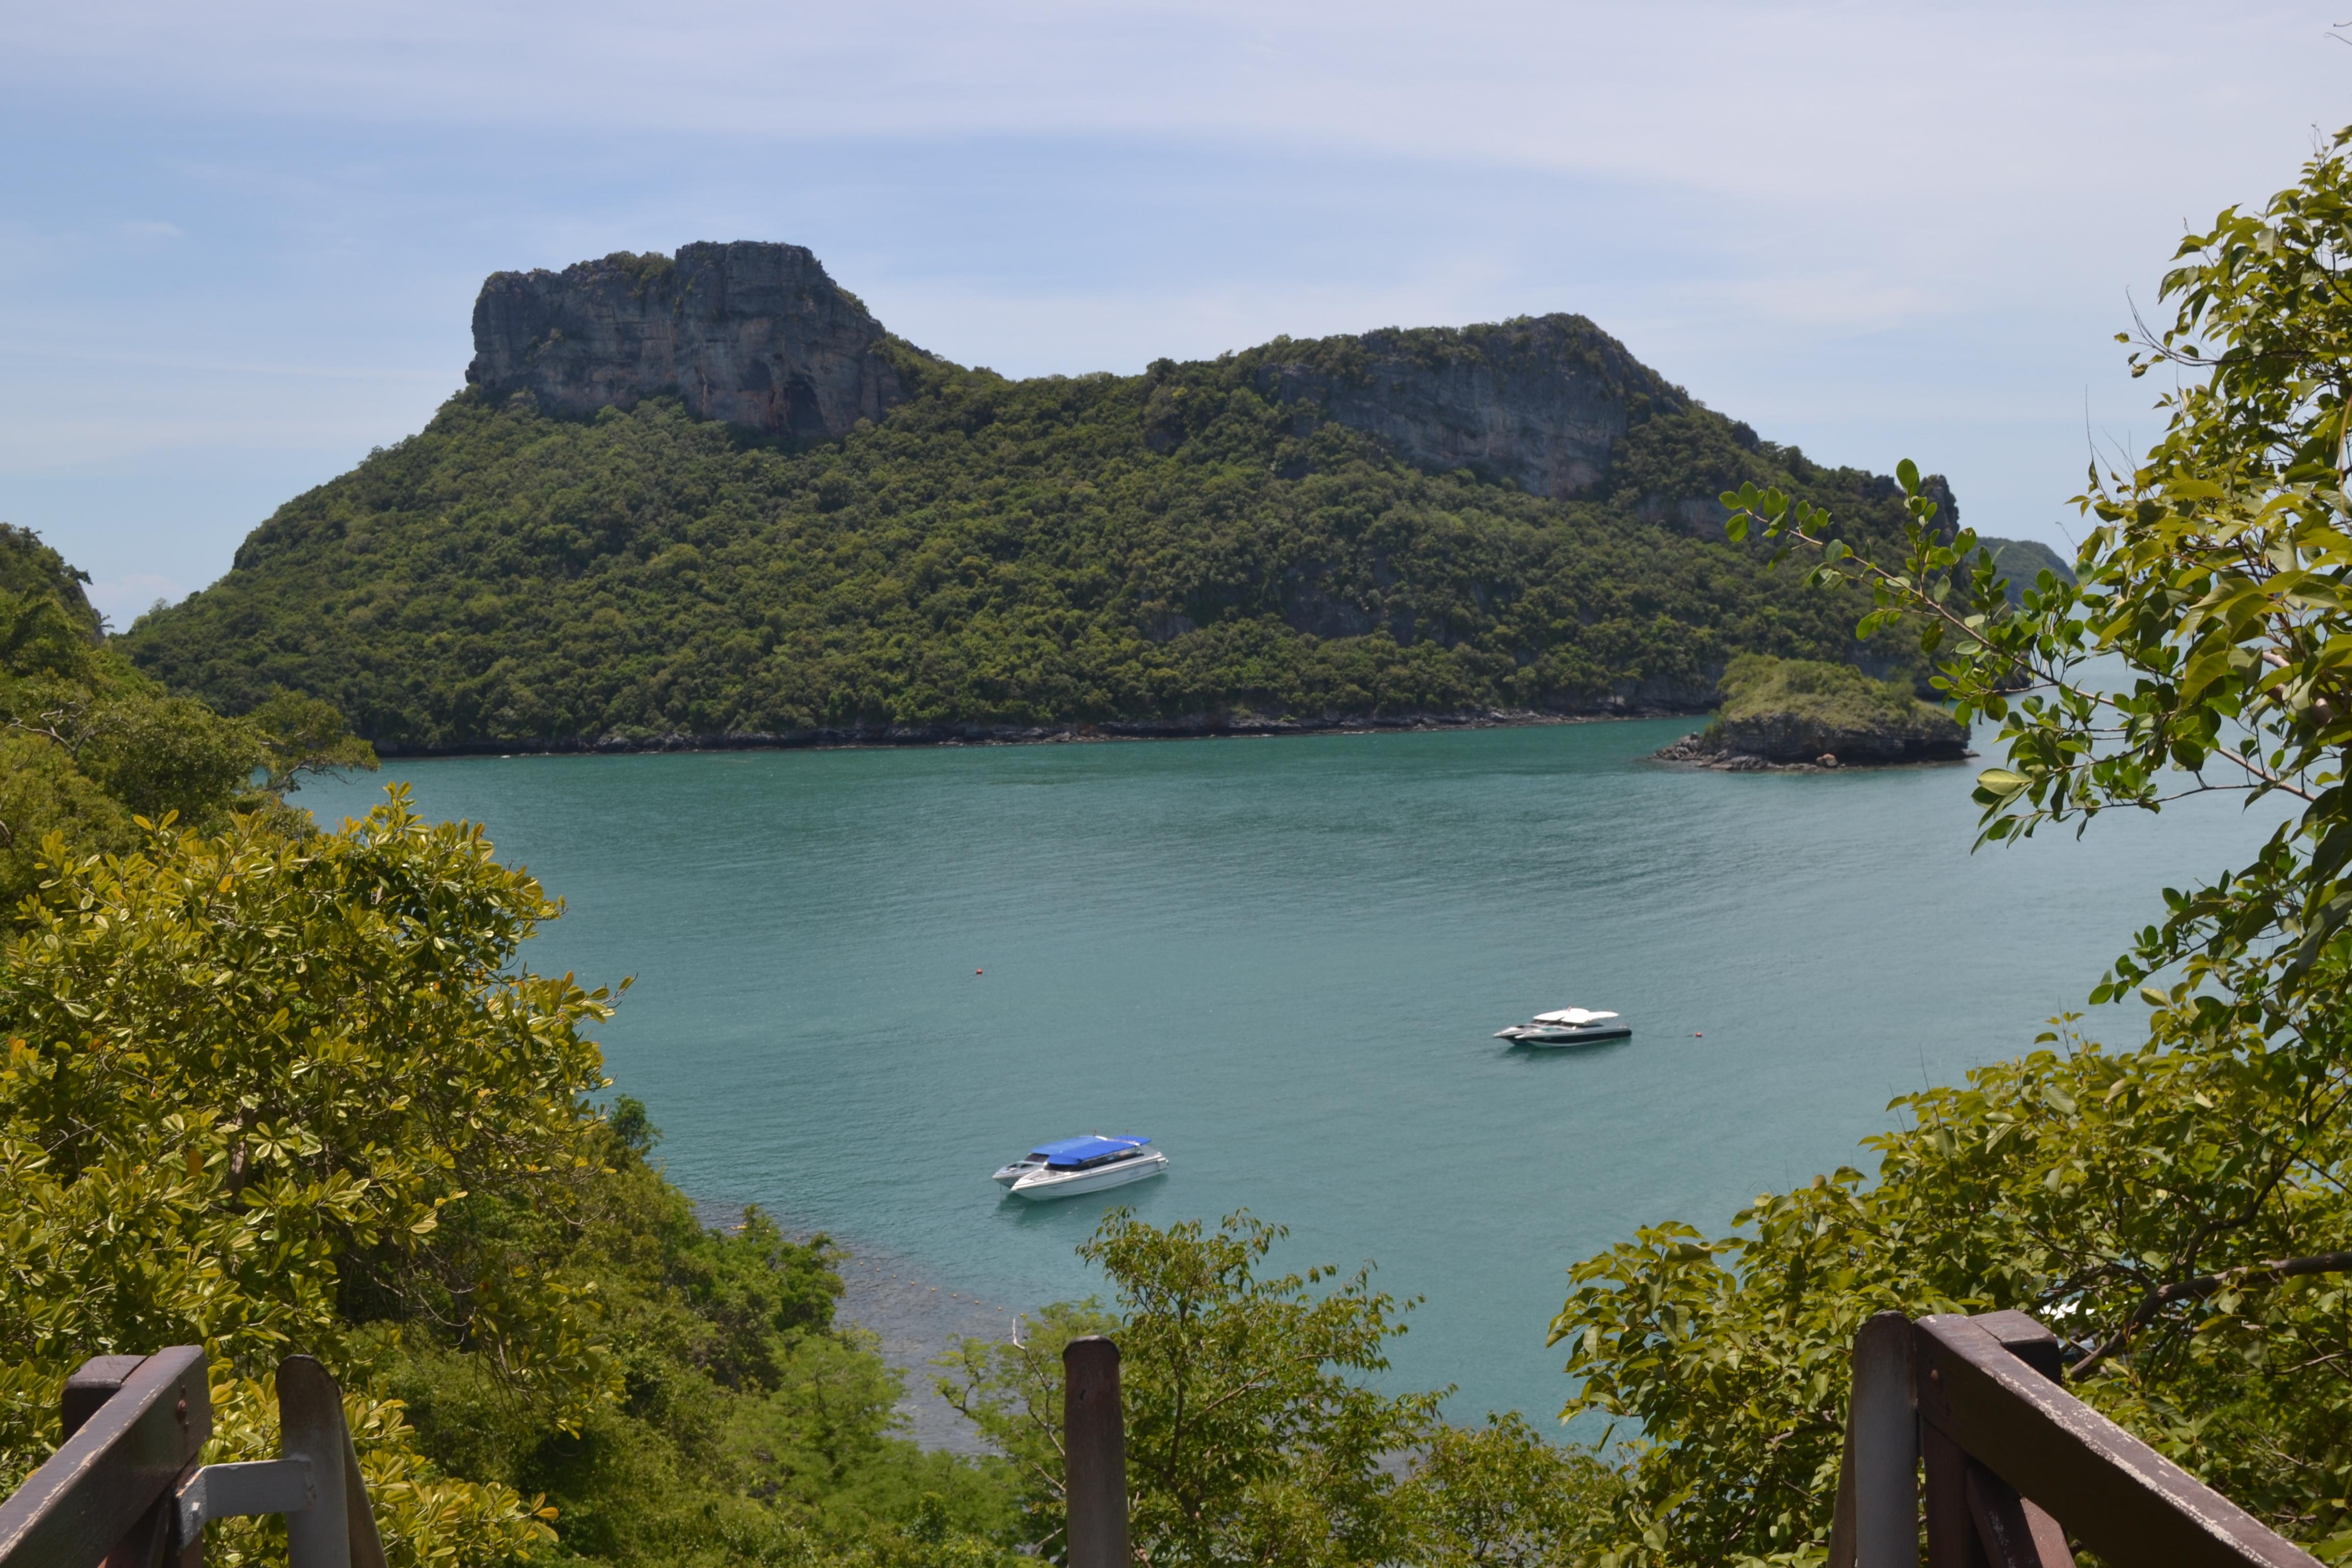 http://viajesalamedida.es/wp-content/uploads/2017/09/DSC_0221.jpg